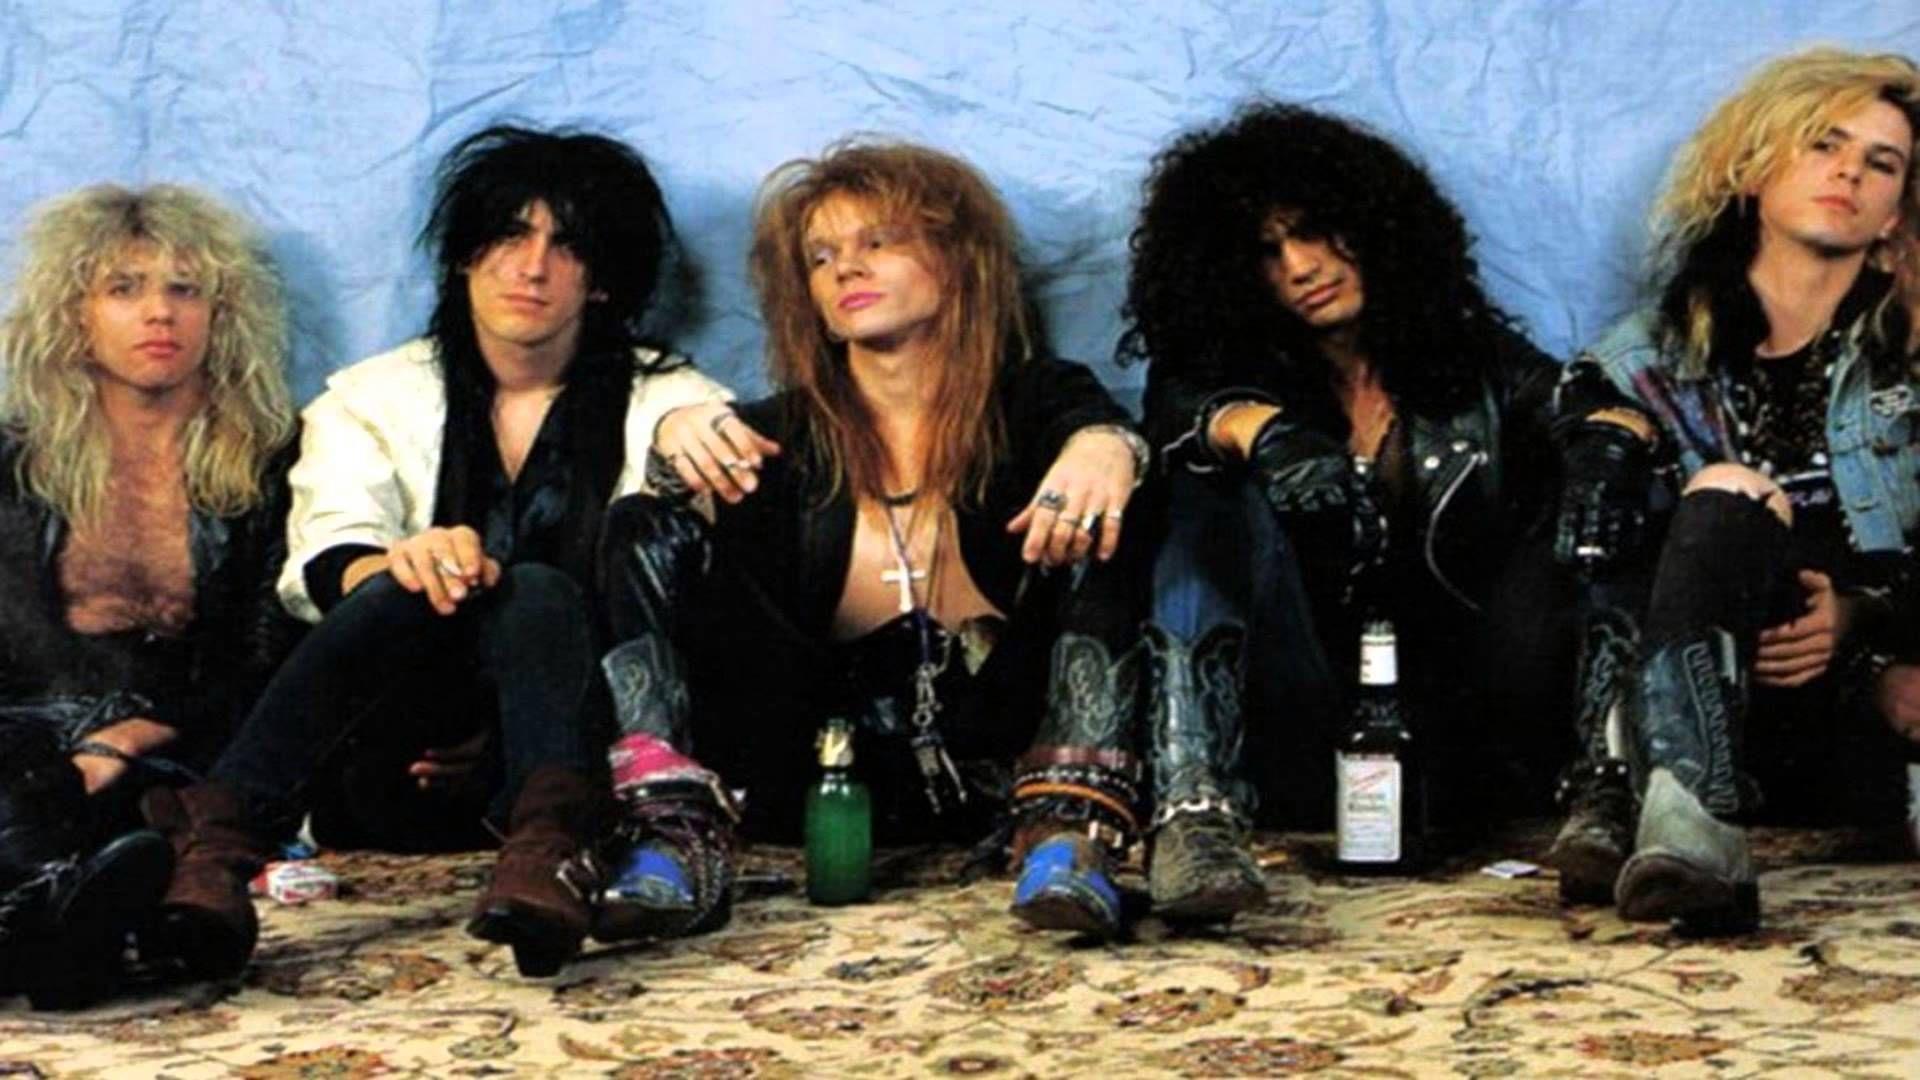 Guns N'Roses - Często zadawane pytania